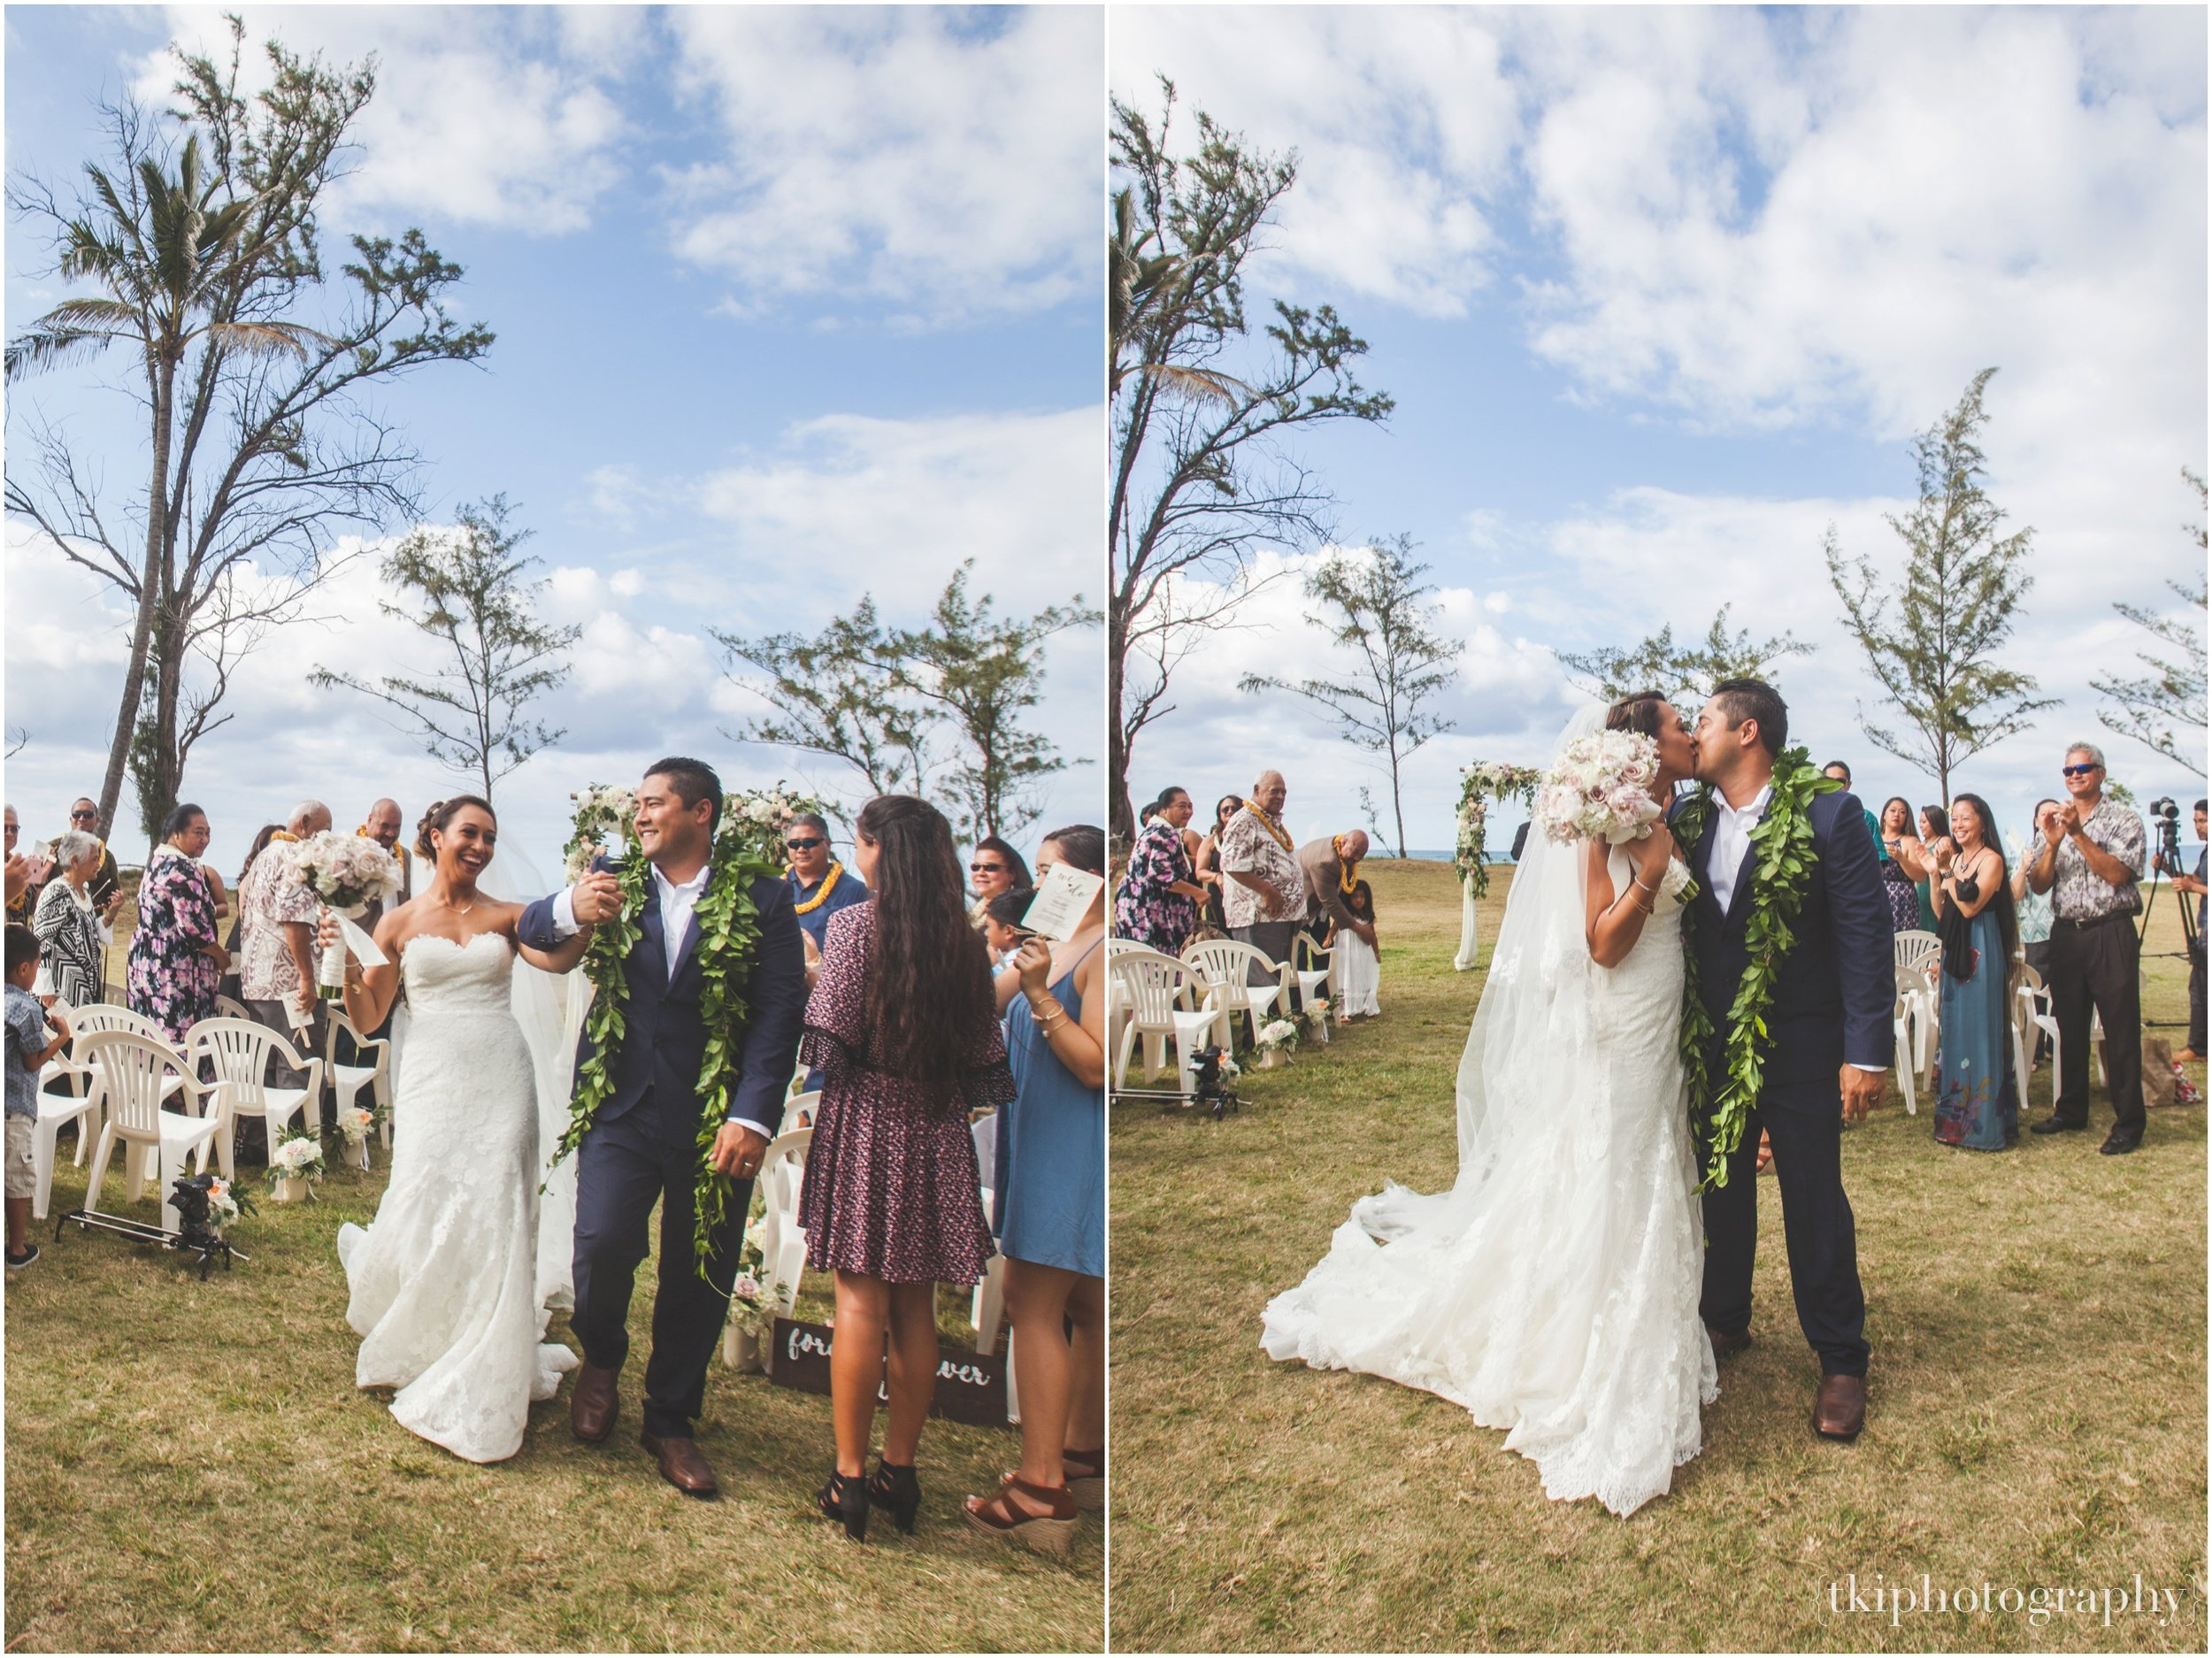 Oahu-Destination-Wedding-Beach_0093.jpg